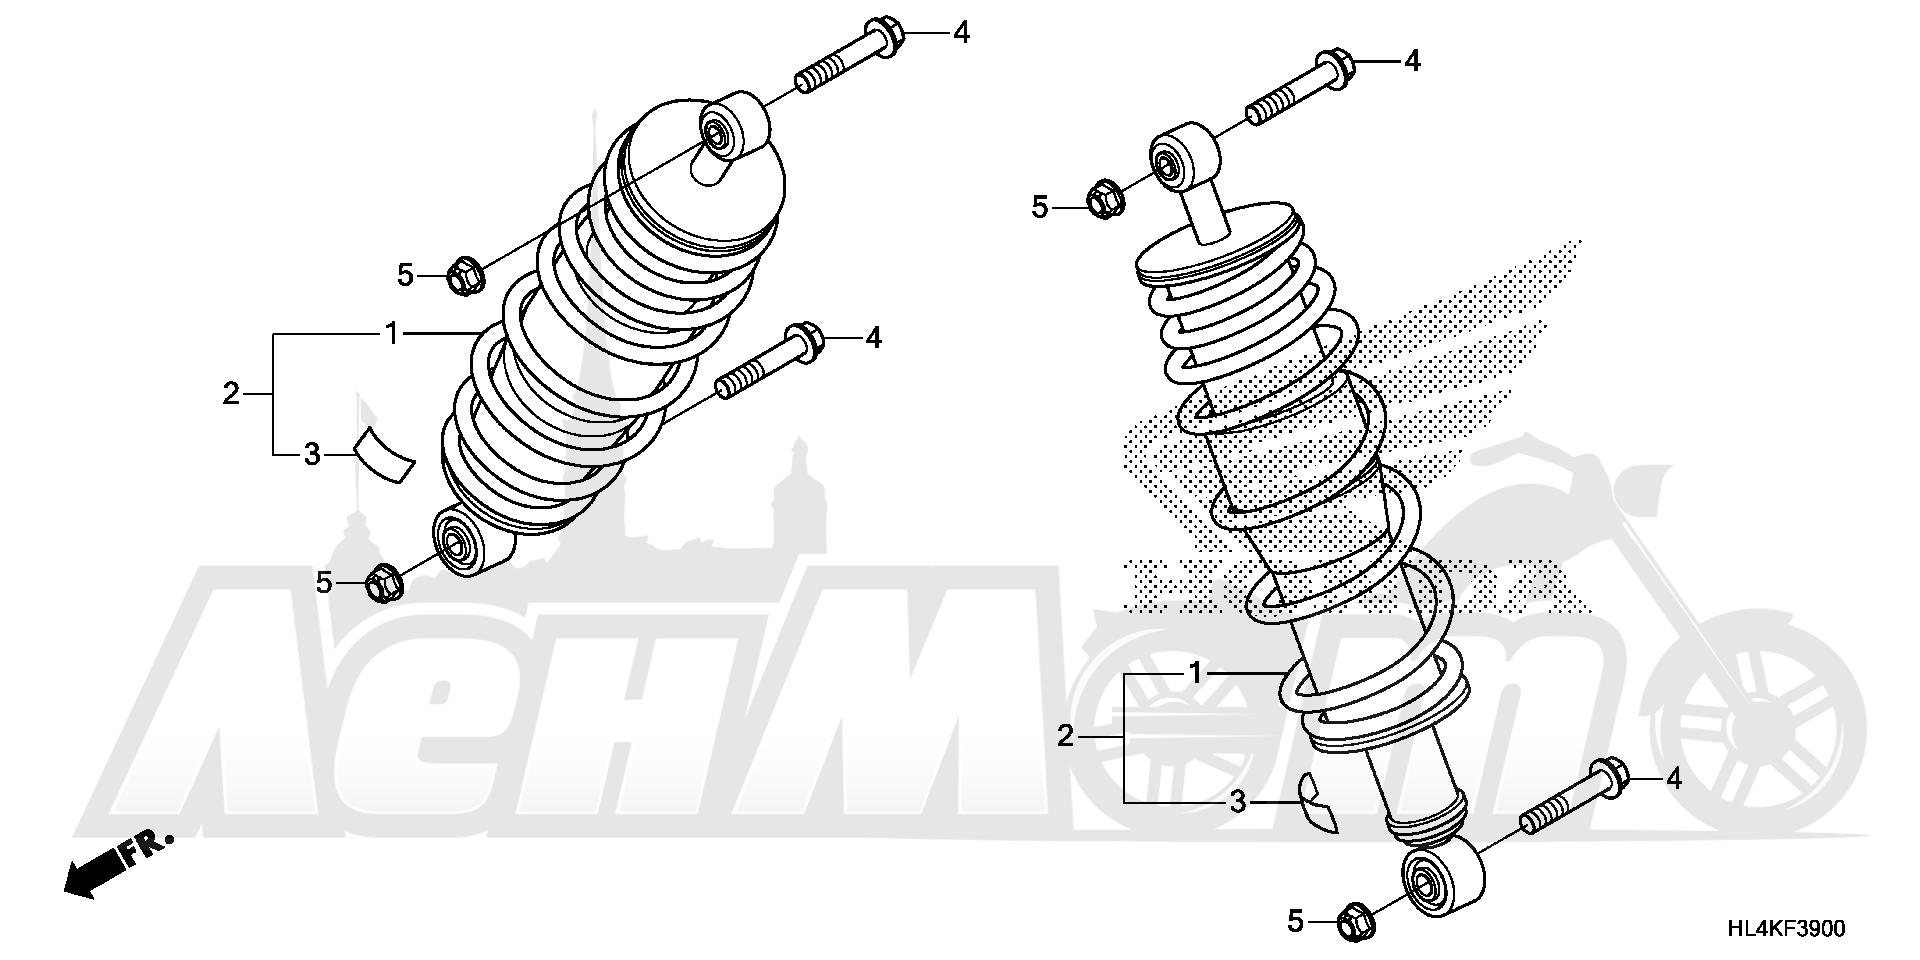 Запчасти для Квадроцикла Honda 2019 SXS1000M5P Раздел: REAR SHOCK ABSORBER (1) | зад амортизатор (1)